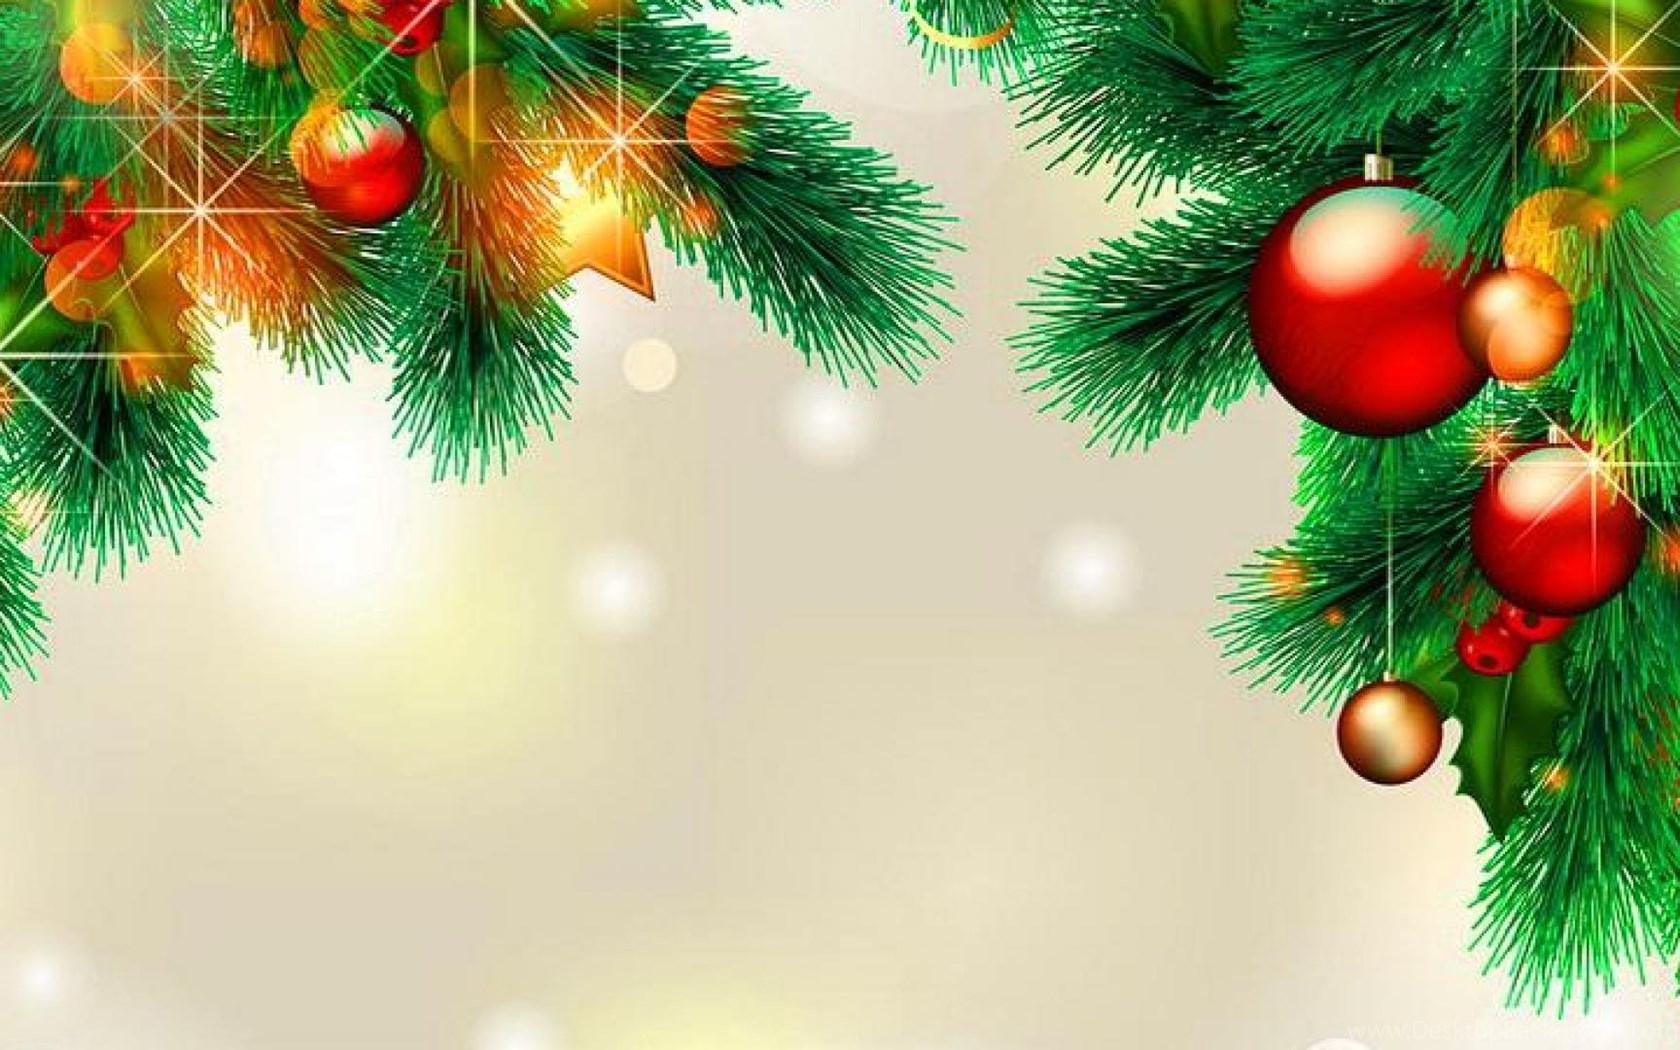 White Christmas Lights Backgrounds Wallpaper. Desktop Background